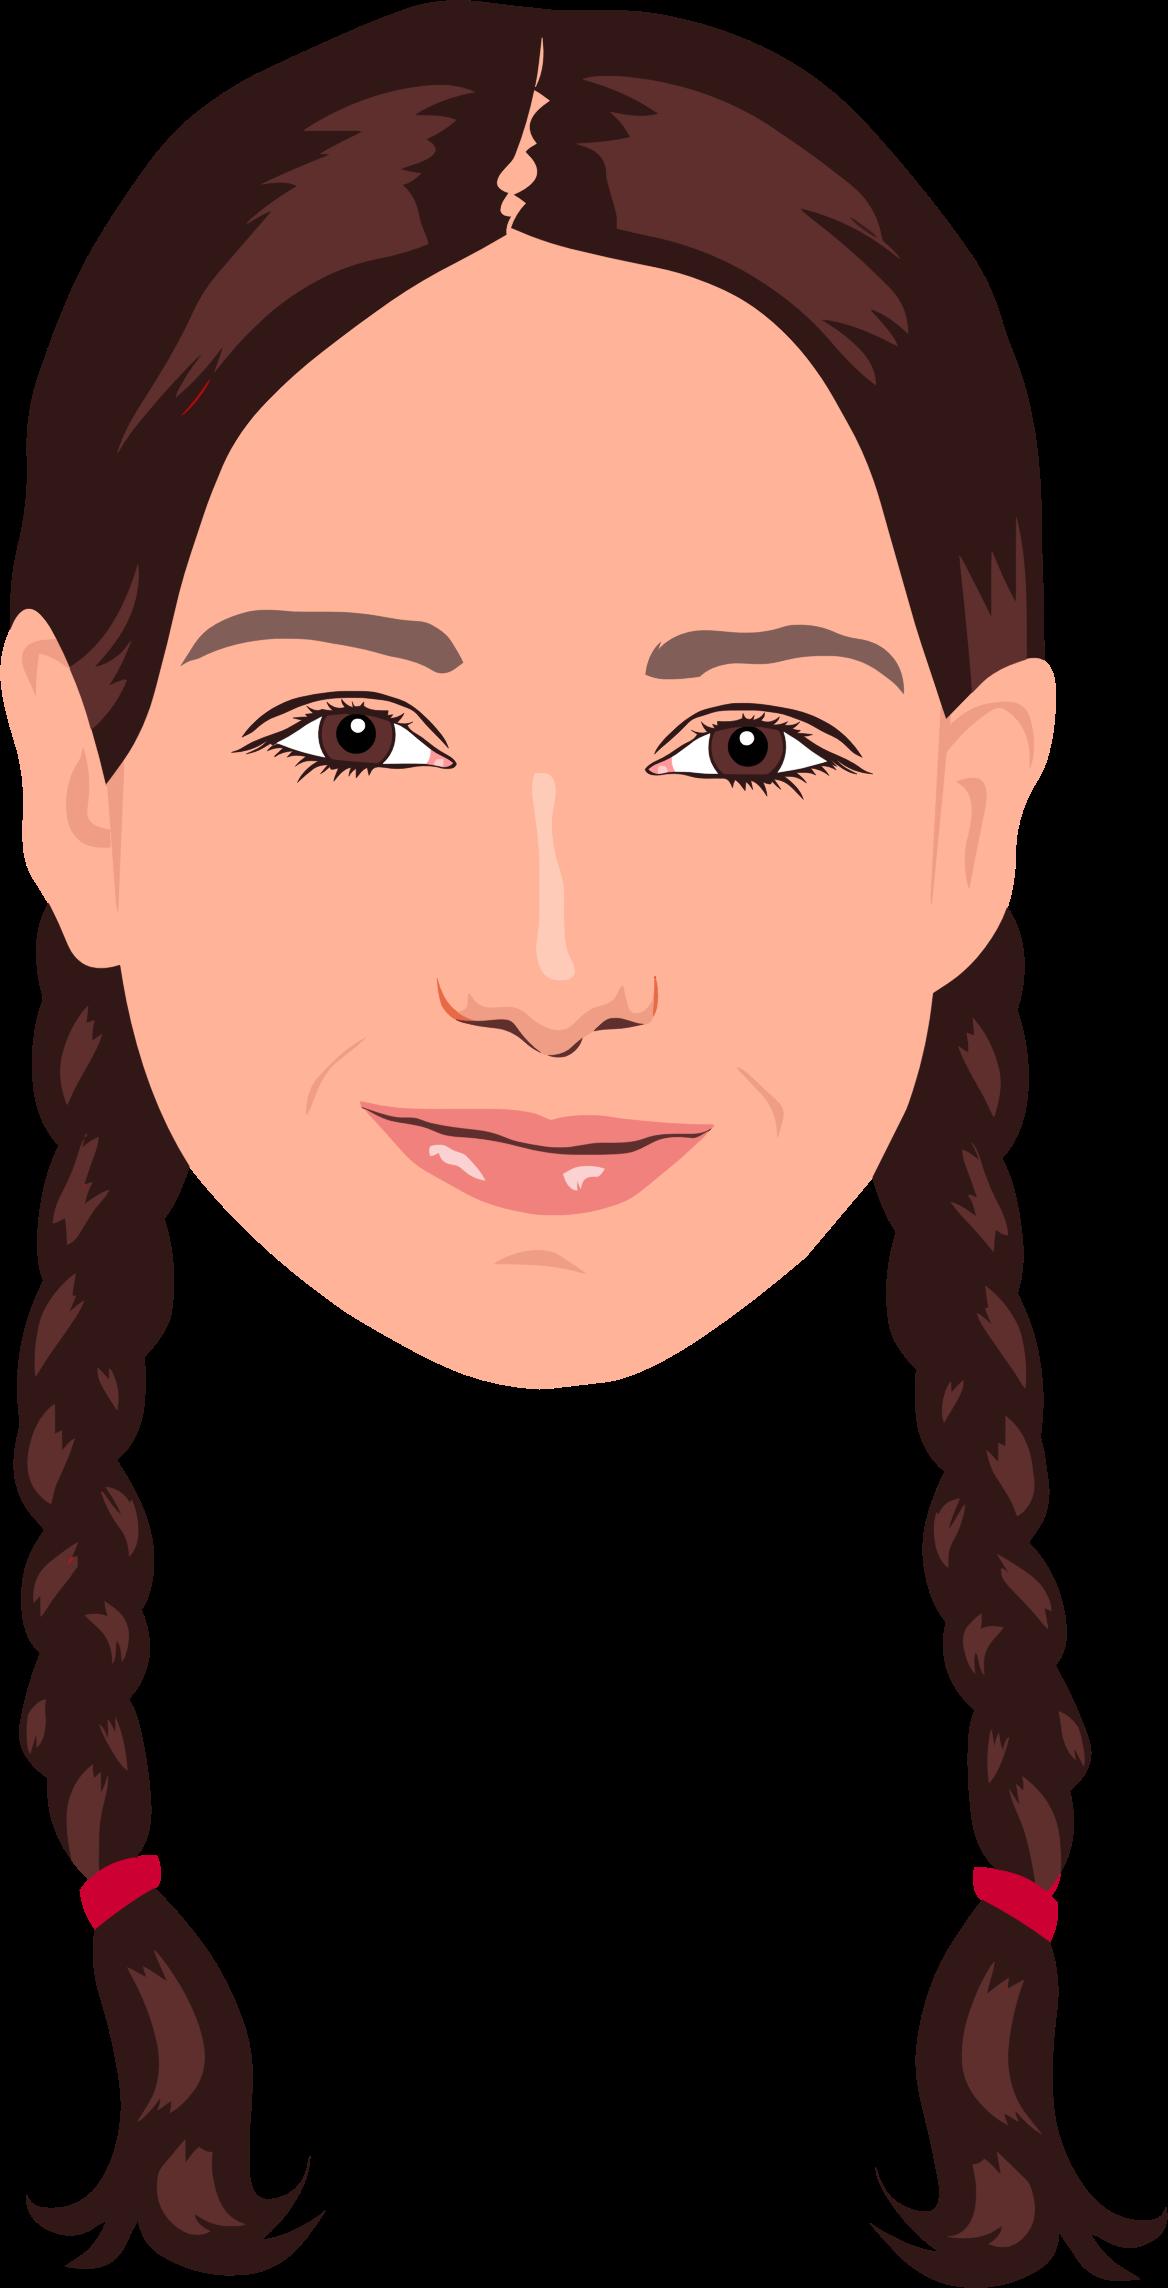 Groundhog clipart realistic. Portrait girl explore pictures